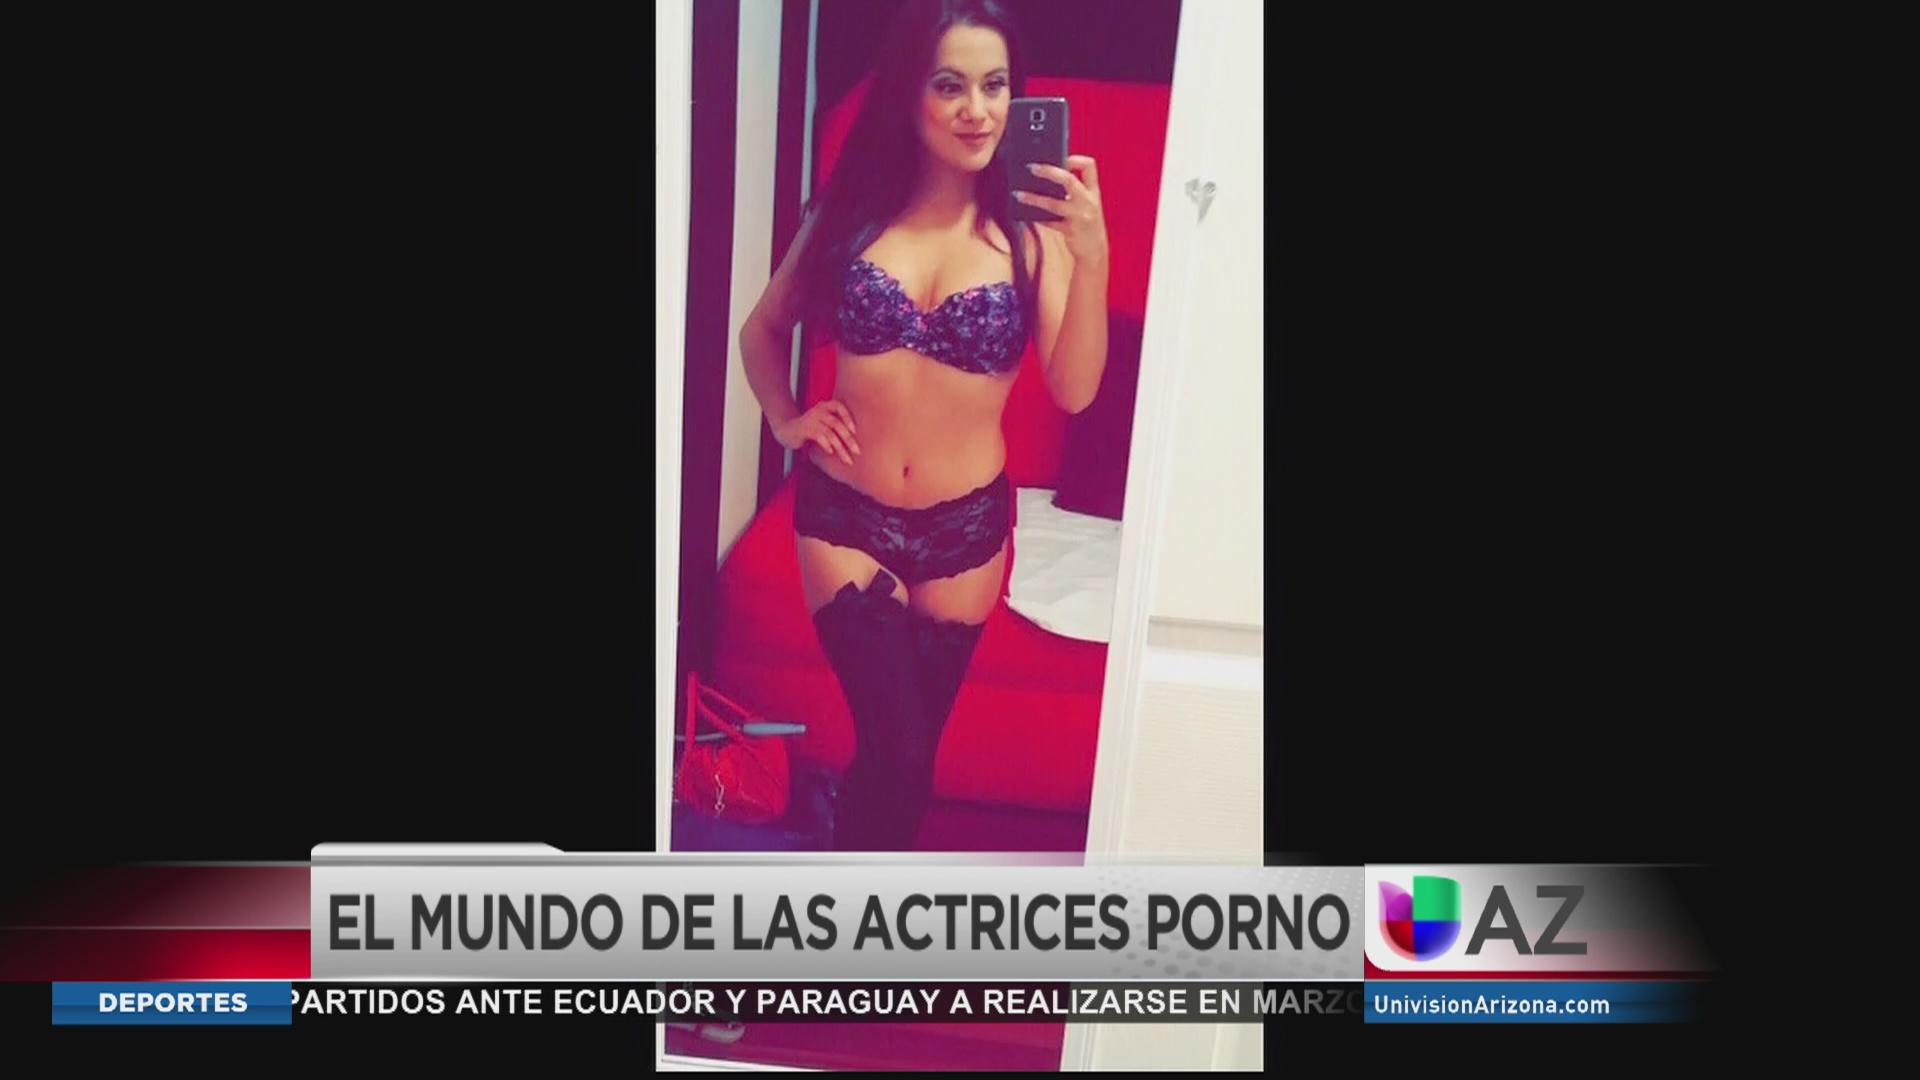 Univision pornó